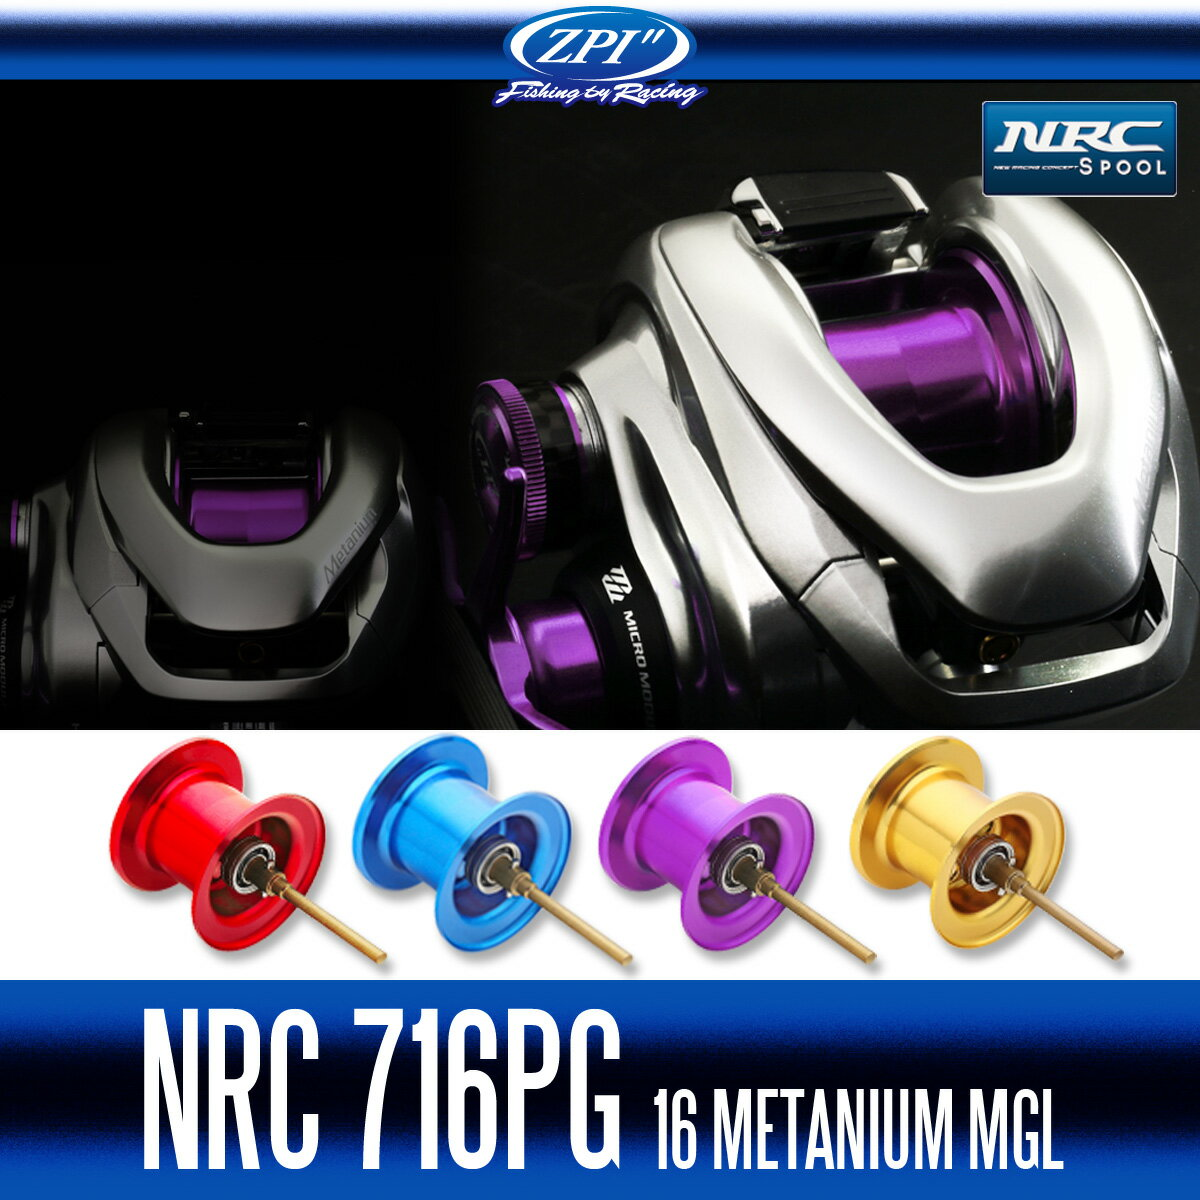 【ZPI】 シマノ 16メタニウムMGL用 NRC716PG スプール